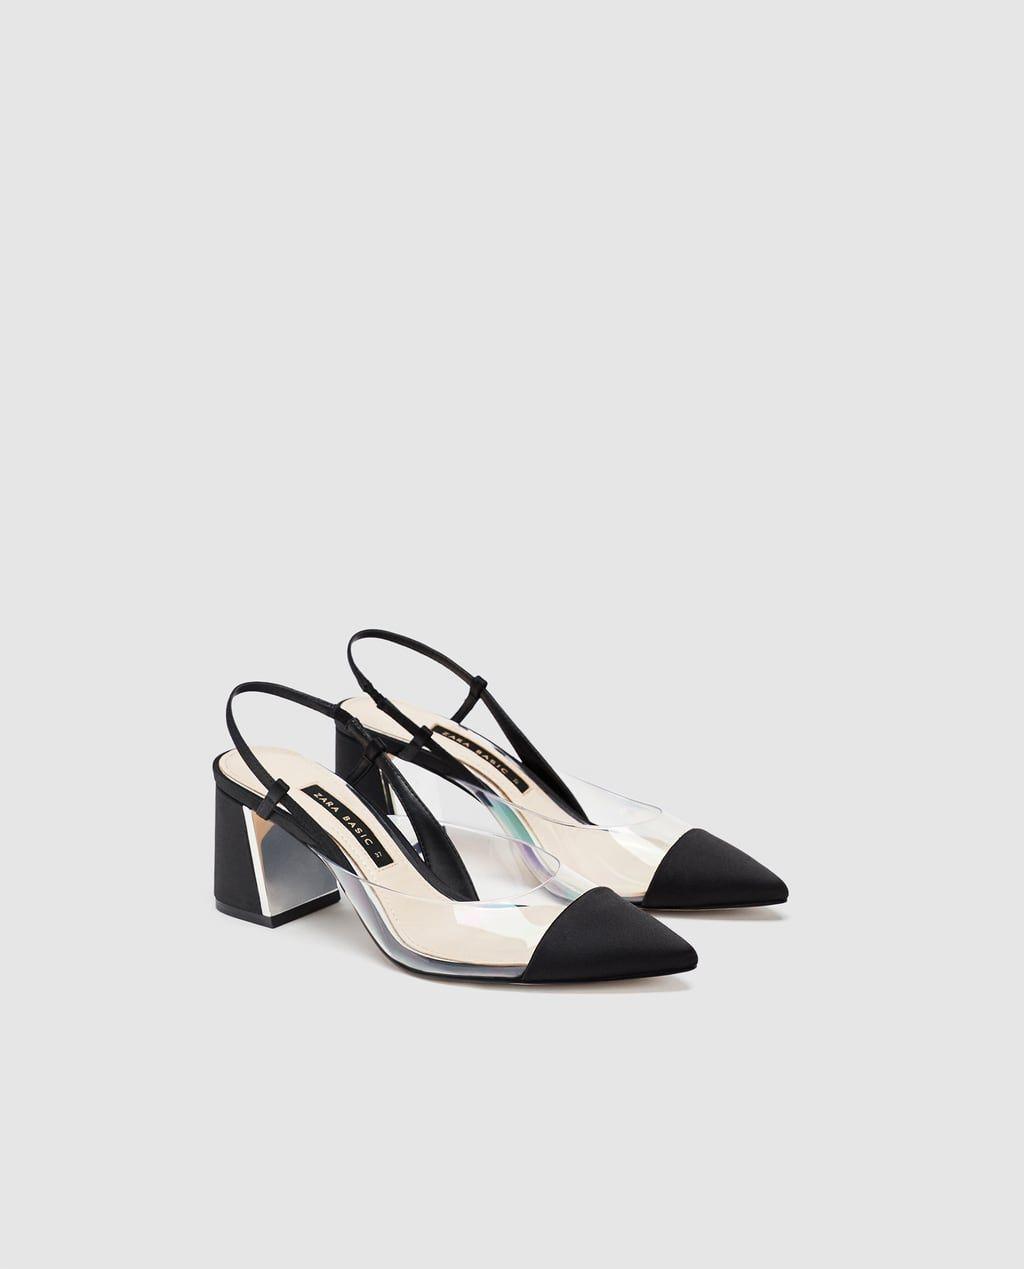 ZAPATO TACÓN DESTALONADO VINILO | Zara mujer zapatos